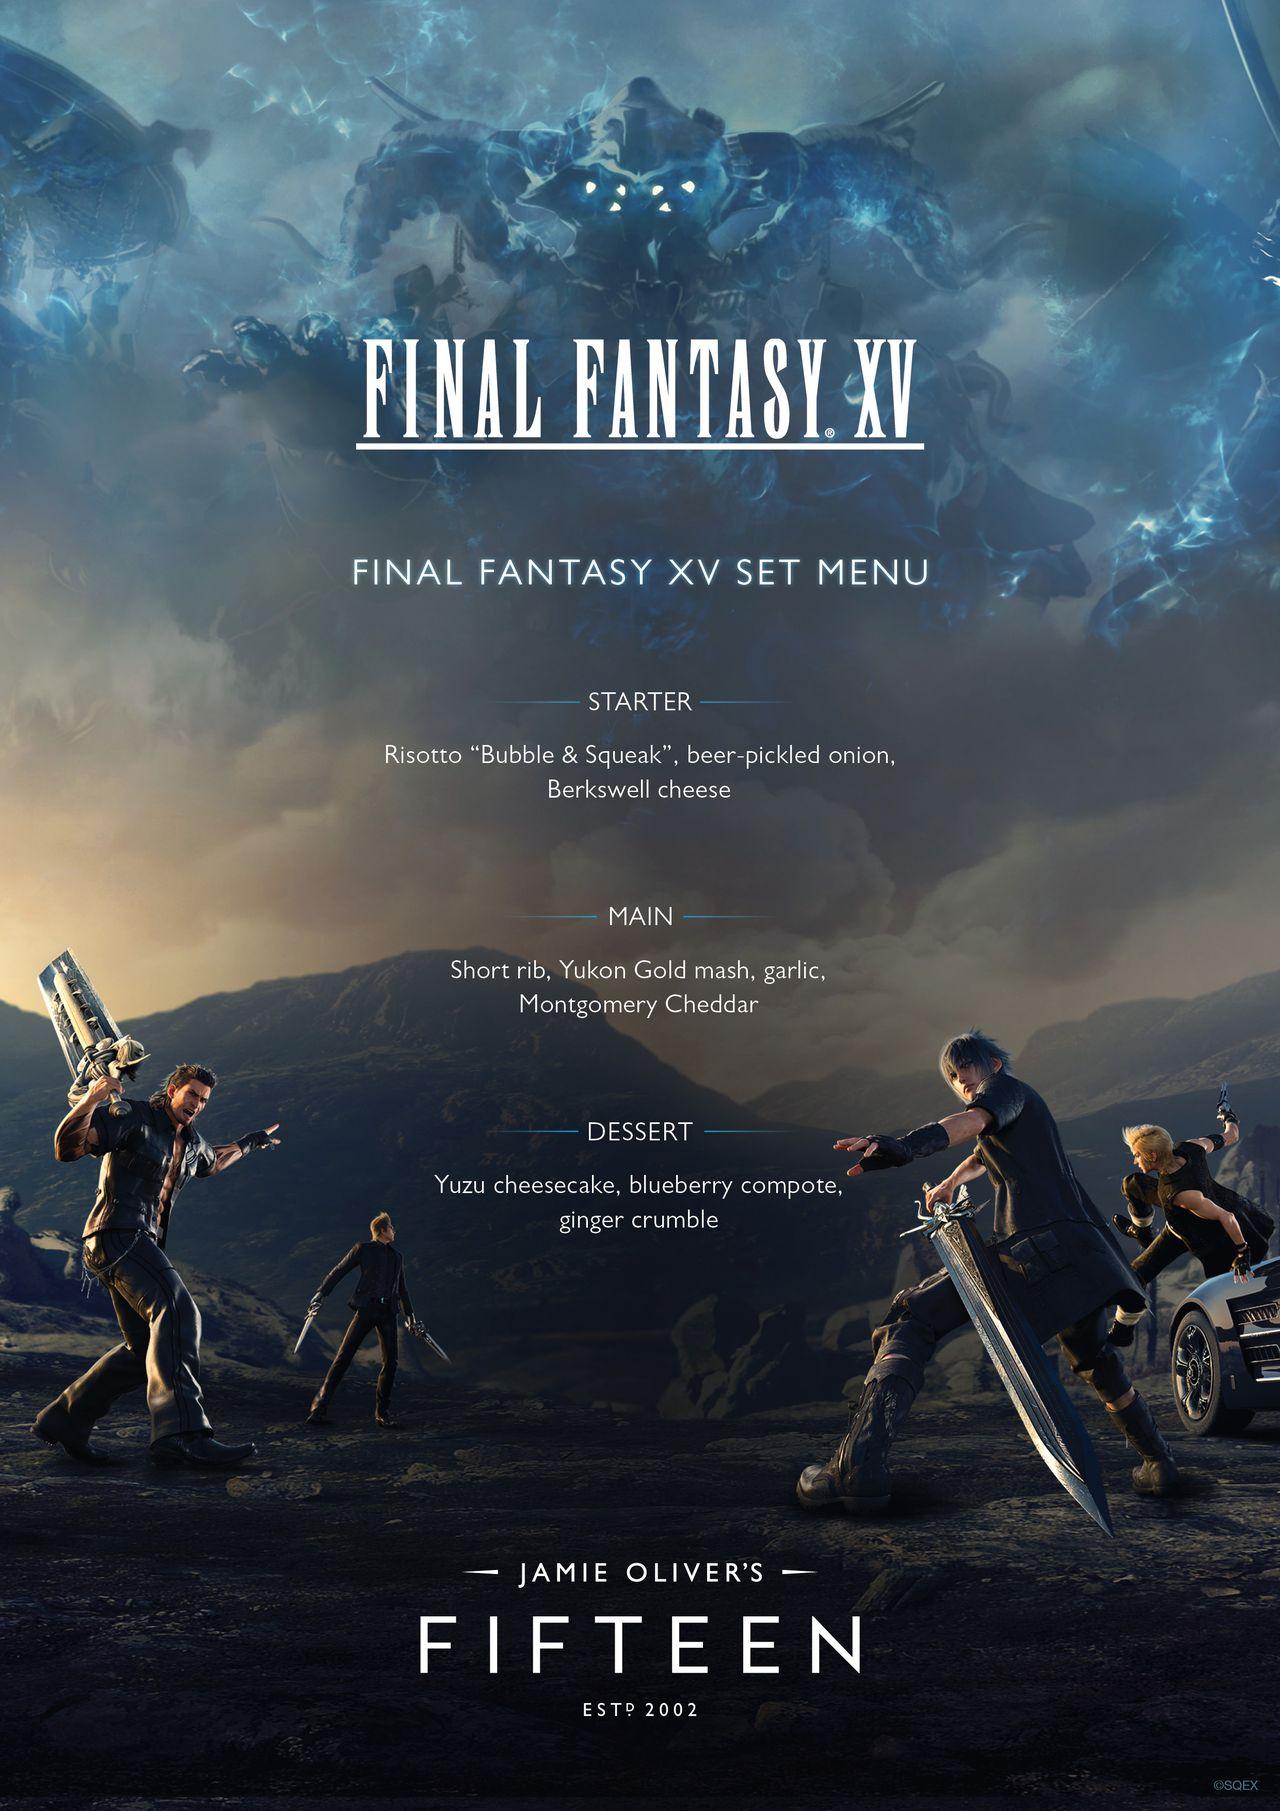 FinalFantasyXV Multi Div 296